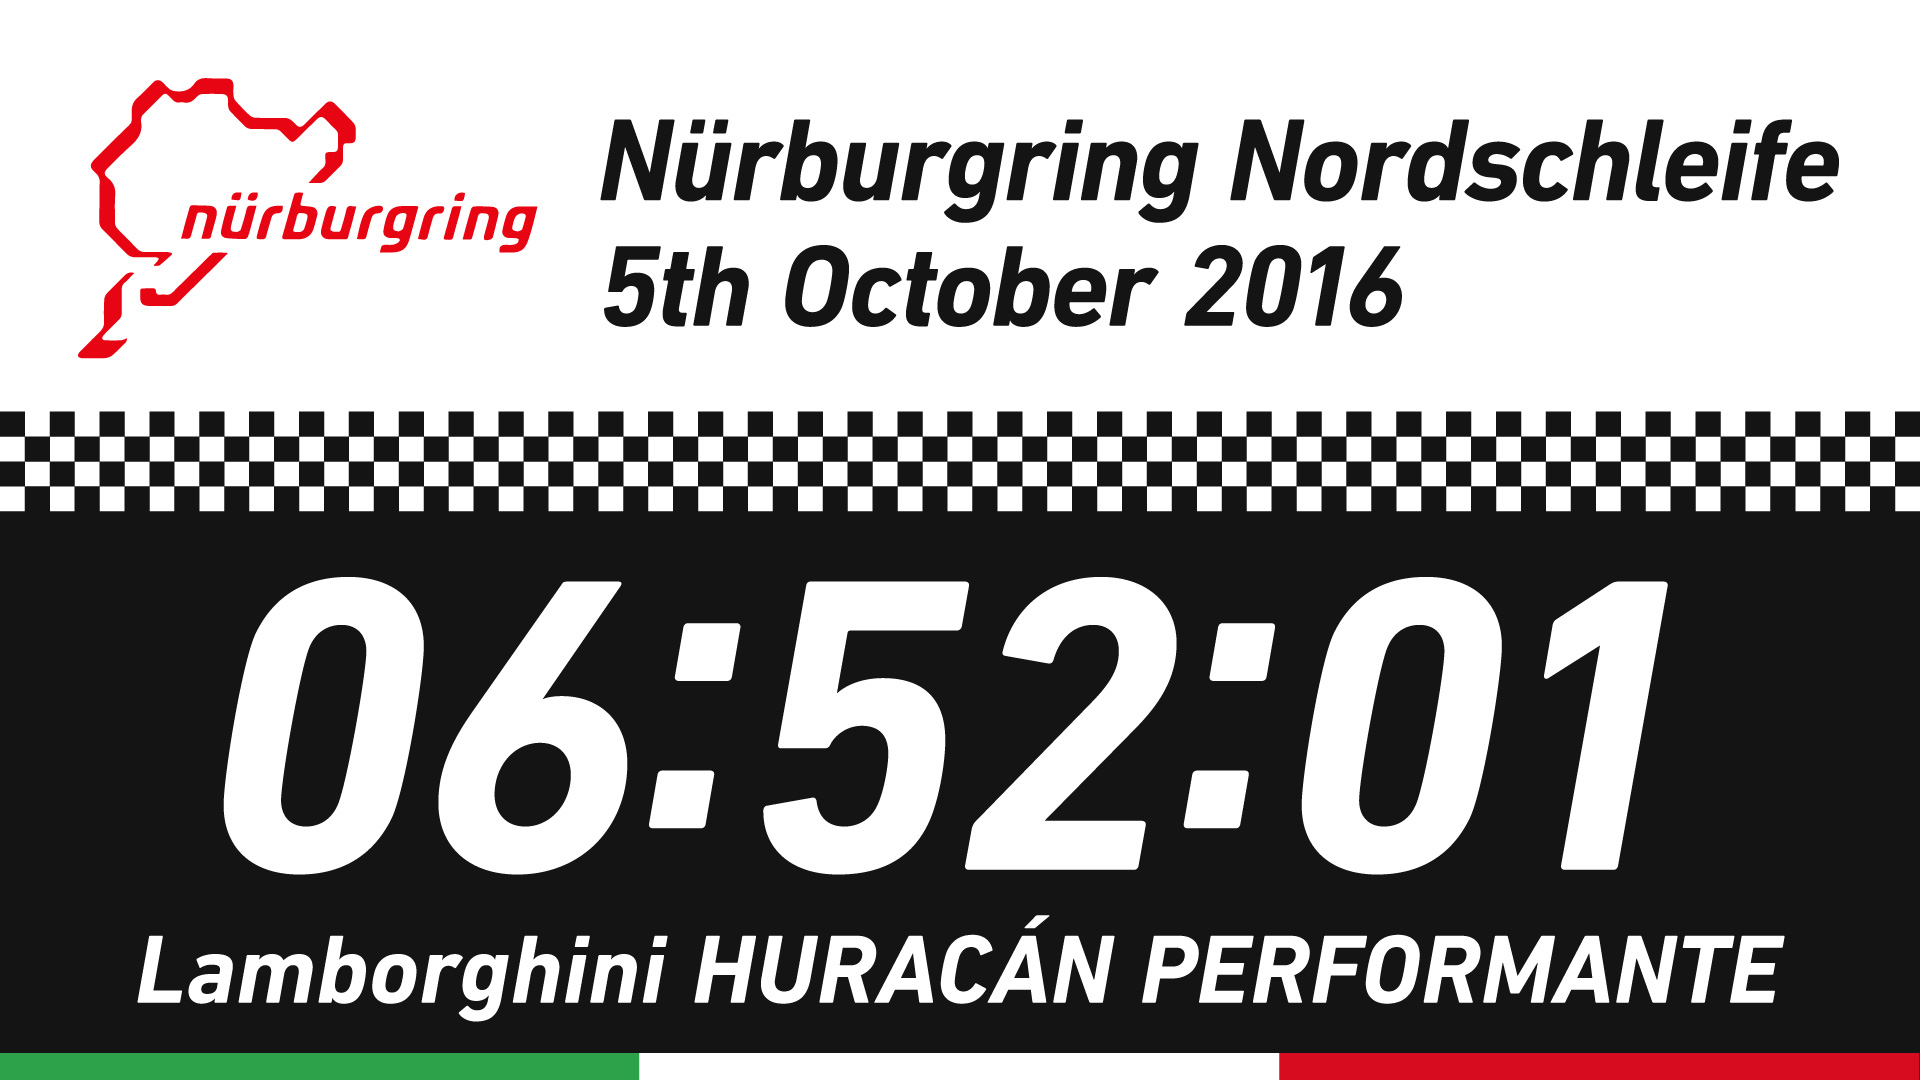 Nürburgring Nordschleife 5 October 2016 6:52:01 Lamborghini HURACÁN PERFORMANTE